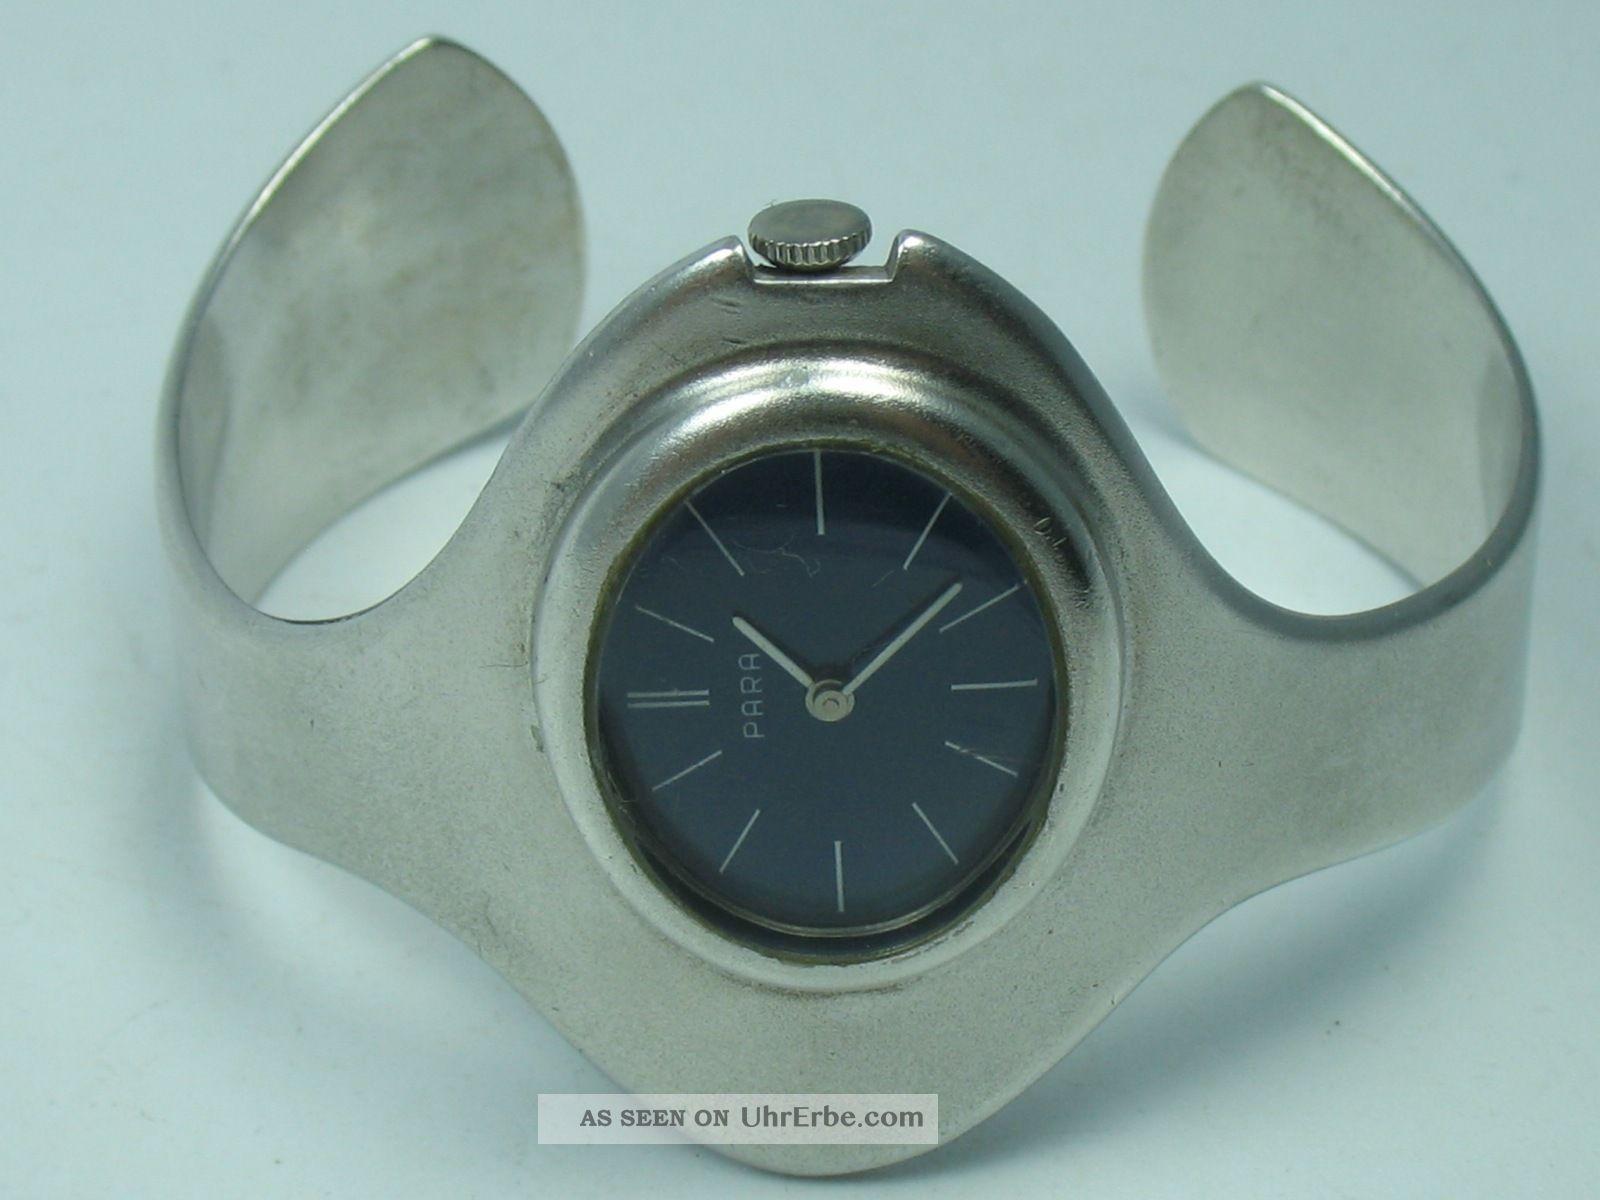 Para : Klasse Massive Designer Damen Spangen Armbanduhr Aus 835 Silber Armbanduhren Bild